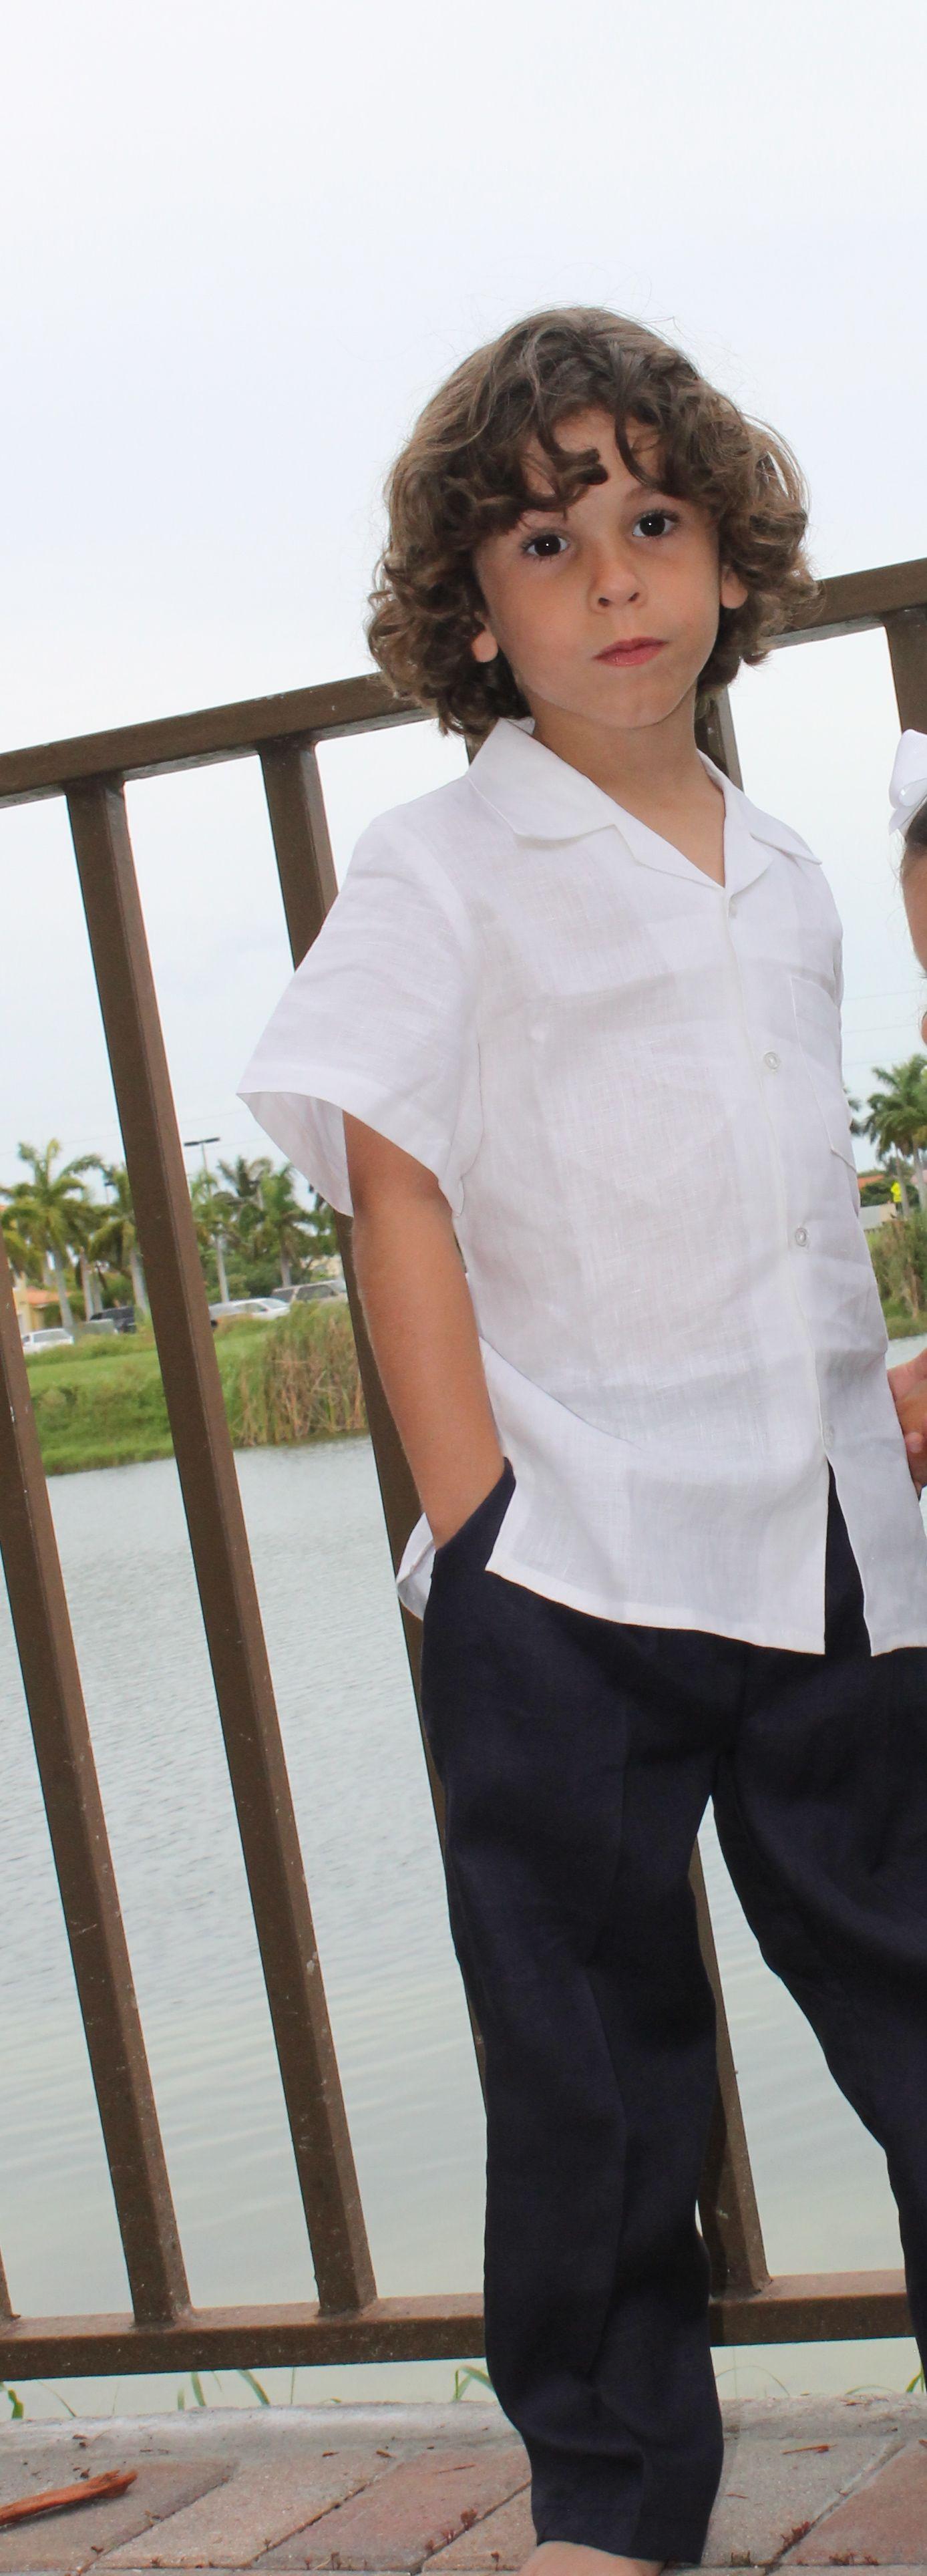 Boys linen shirts and pants tiny little people pinterest